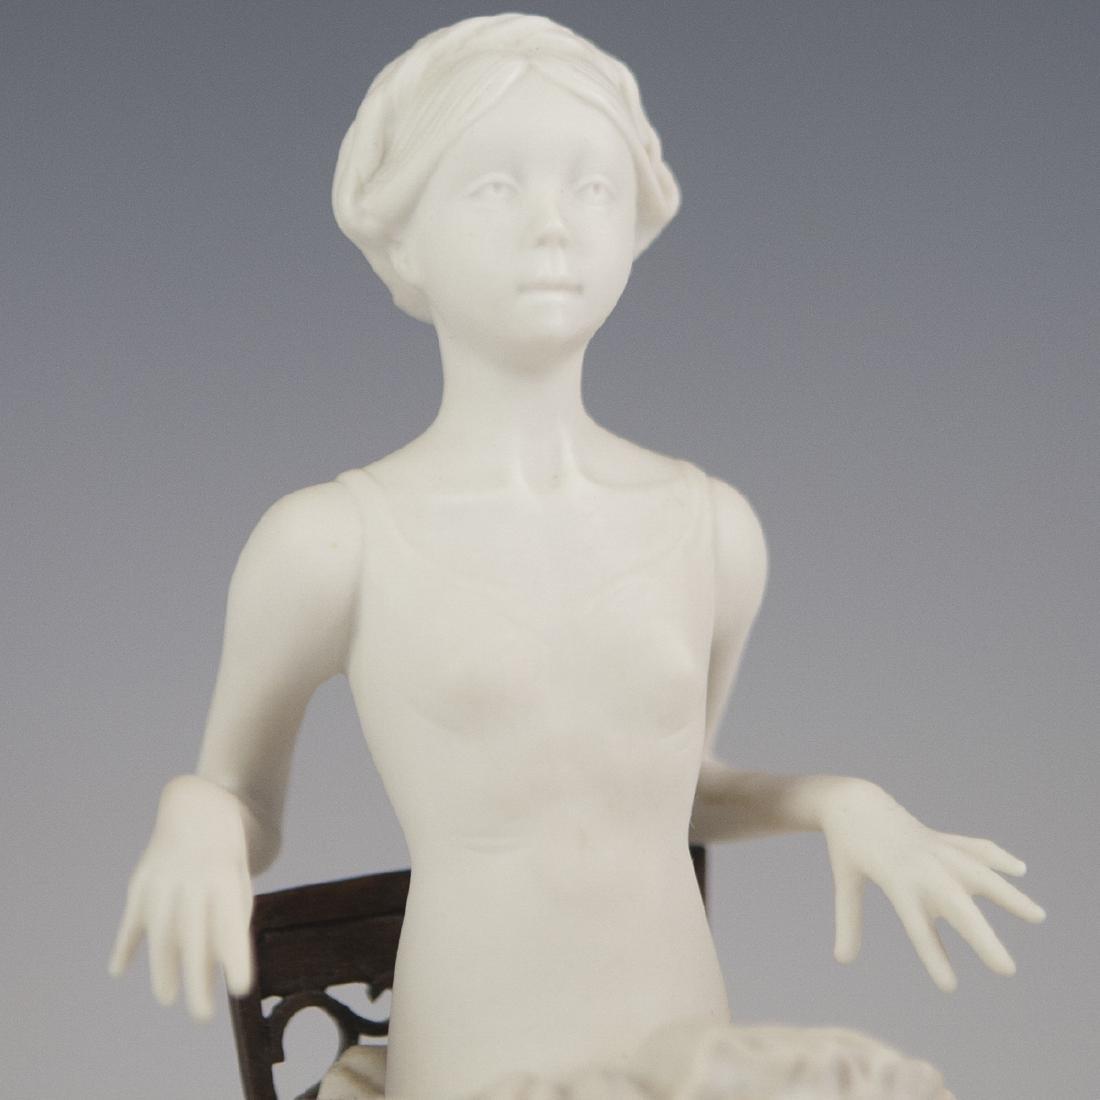 Boehm Porcelain Figurine - 2